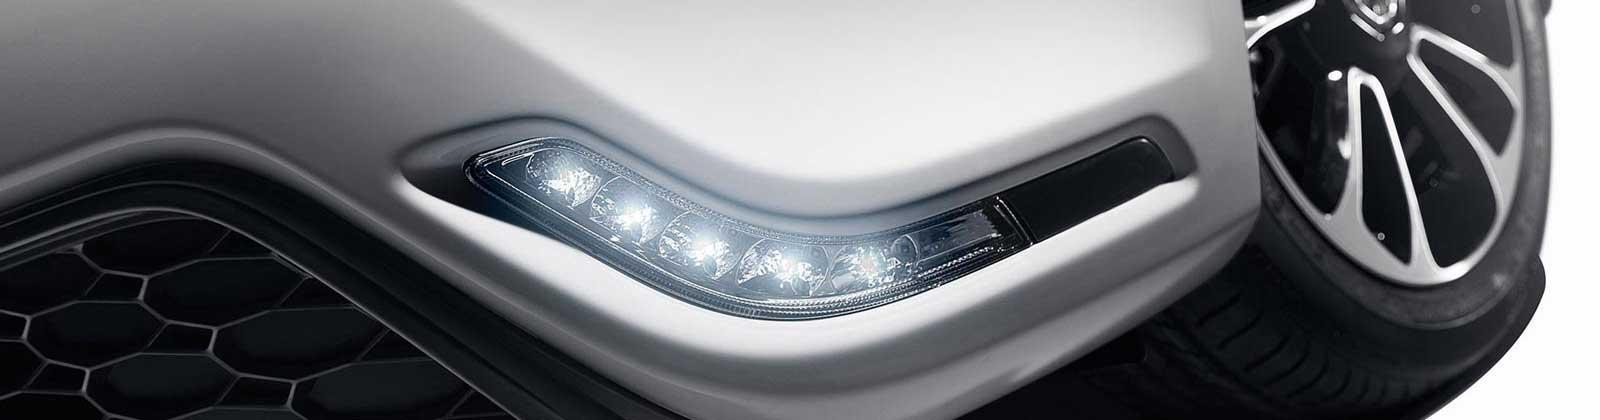 MG MG3 LED daytime running lights